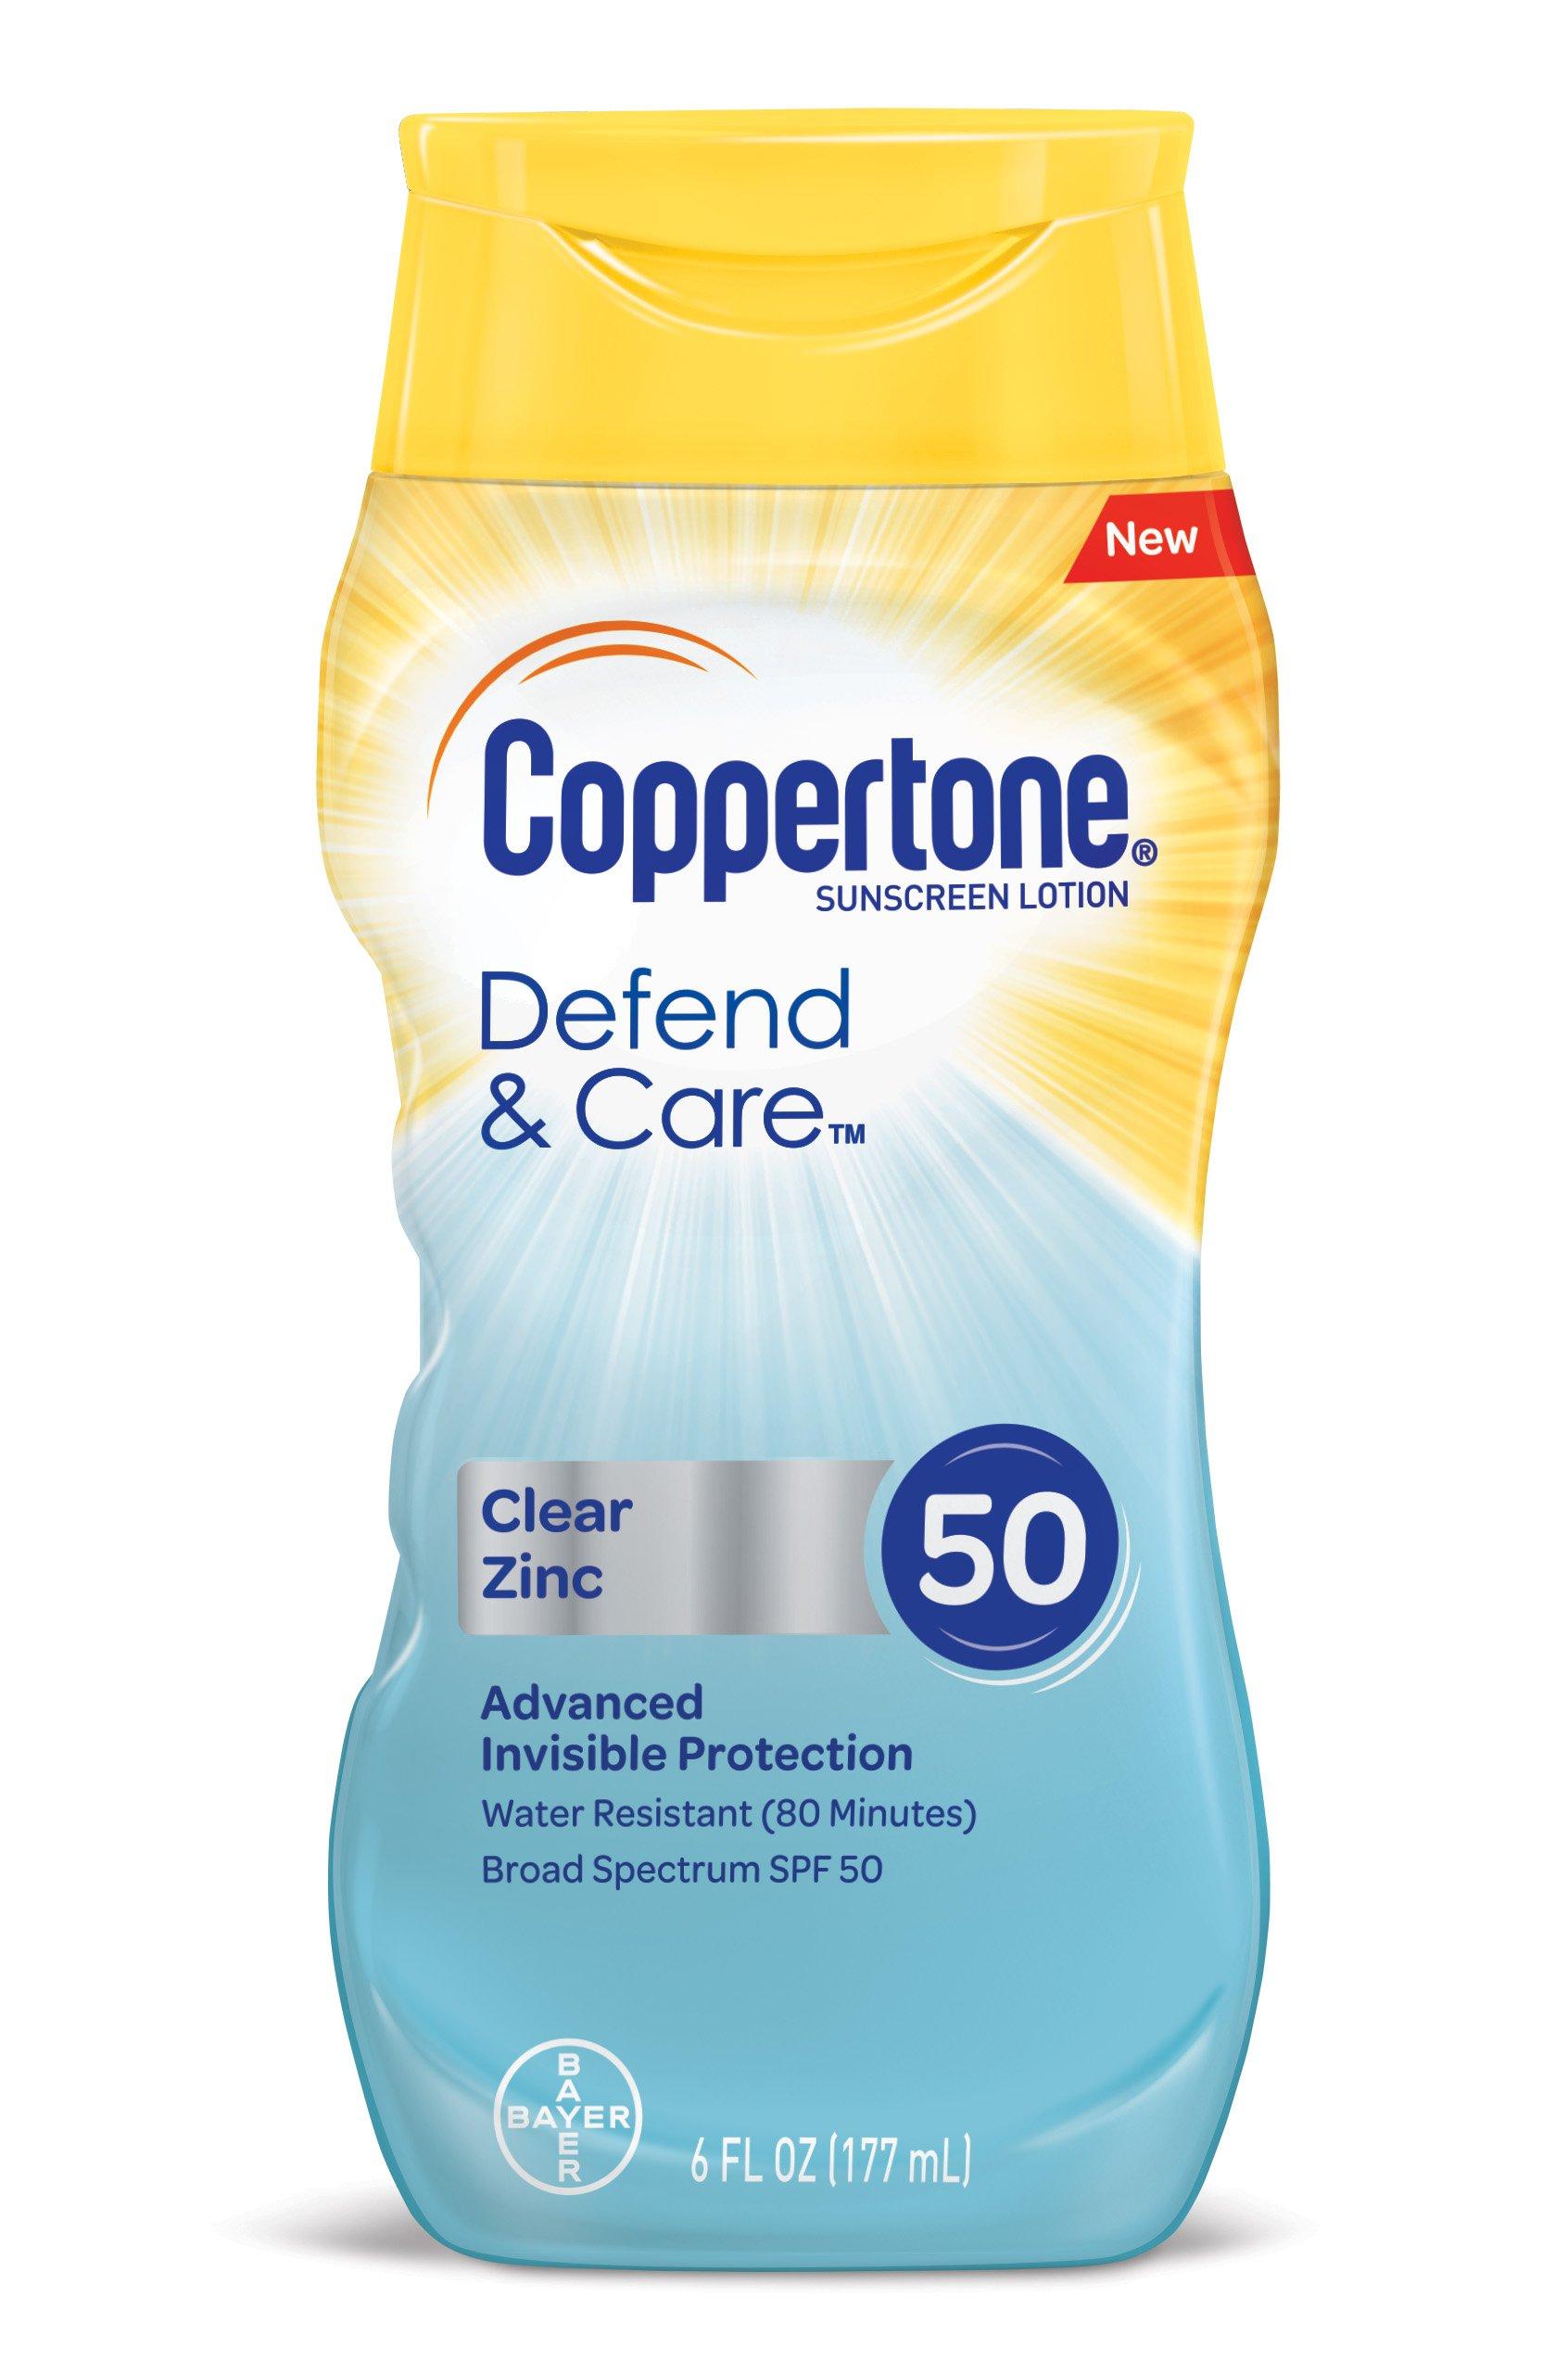 amazoncom coppertone defend amp care clear zinc sunscreen